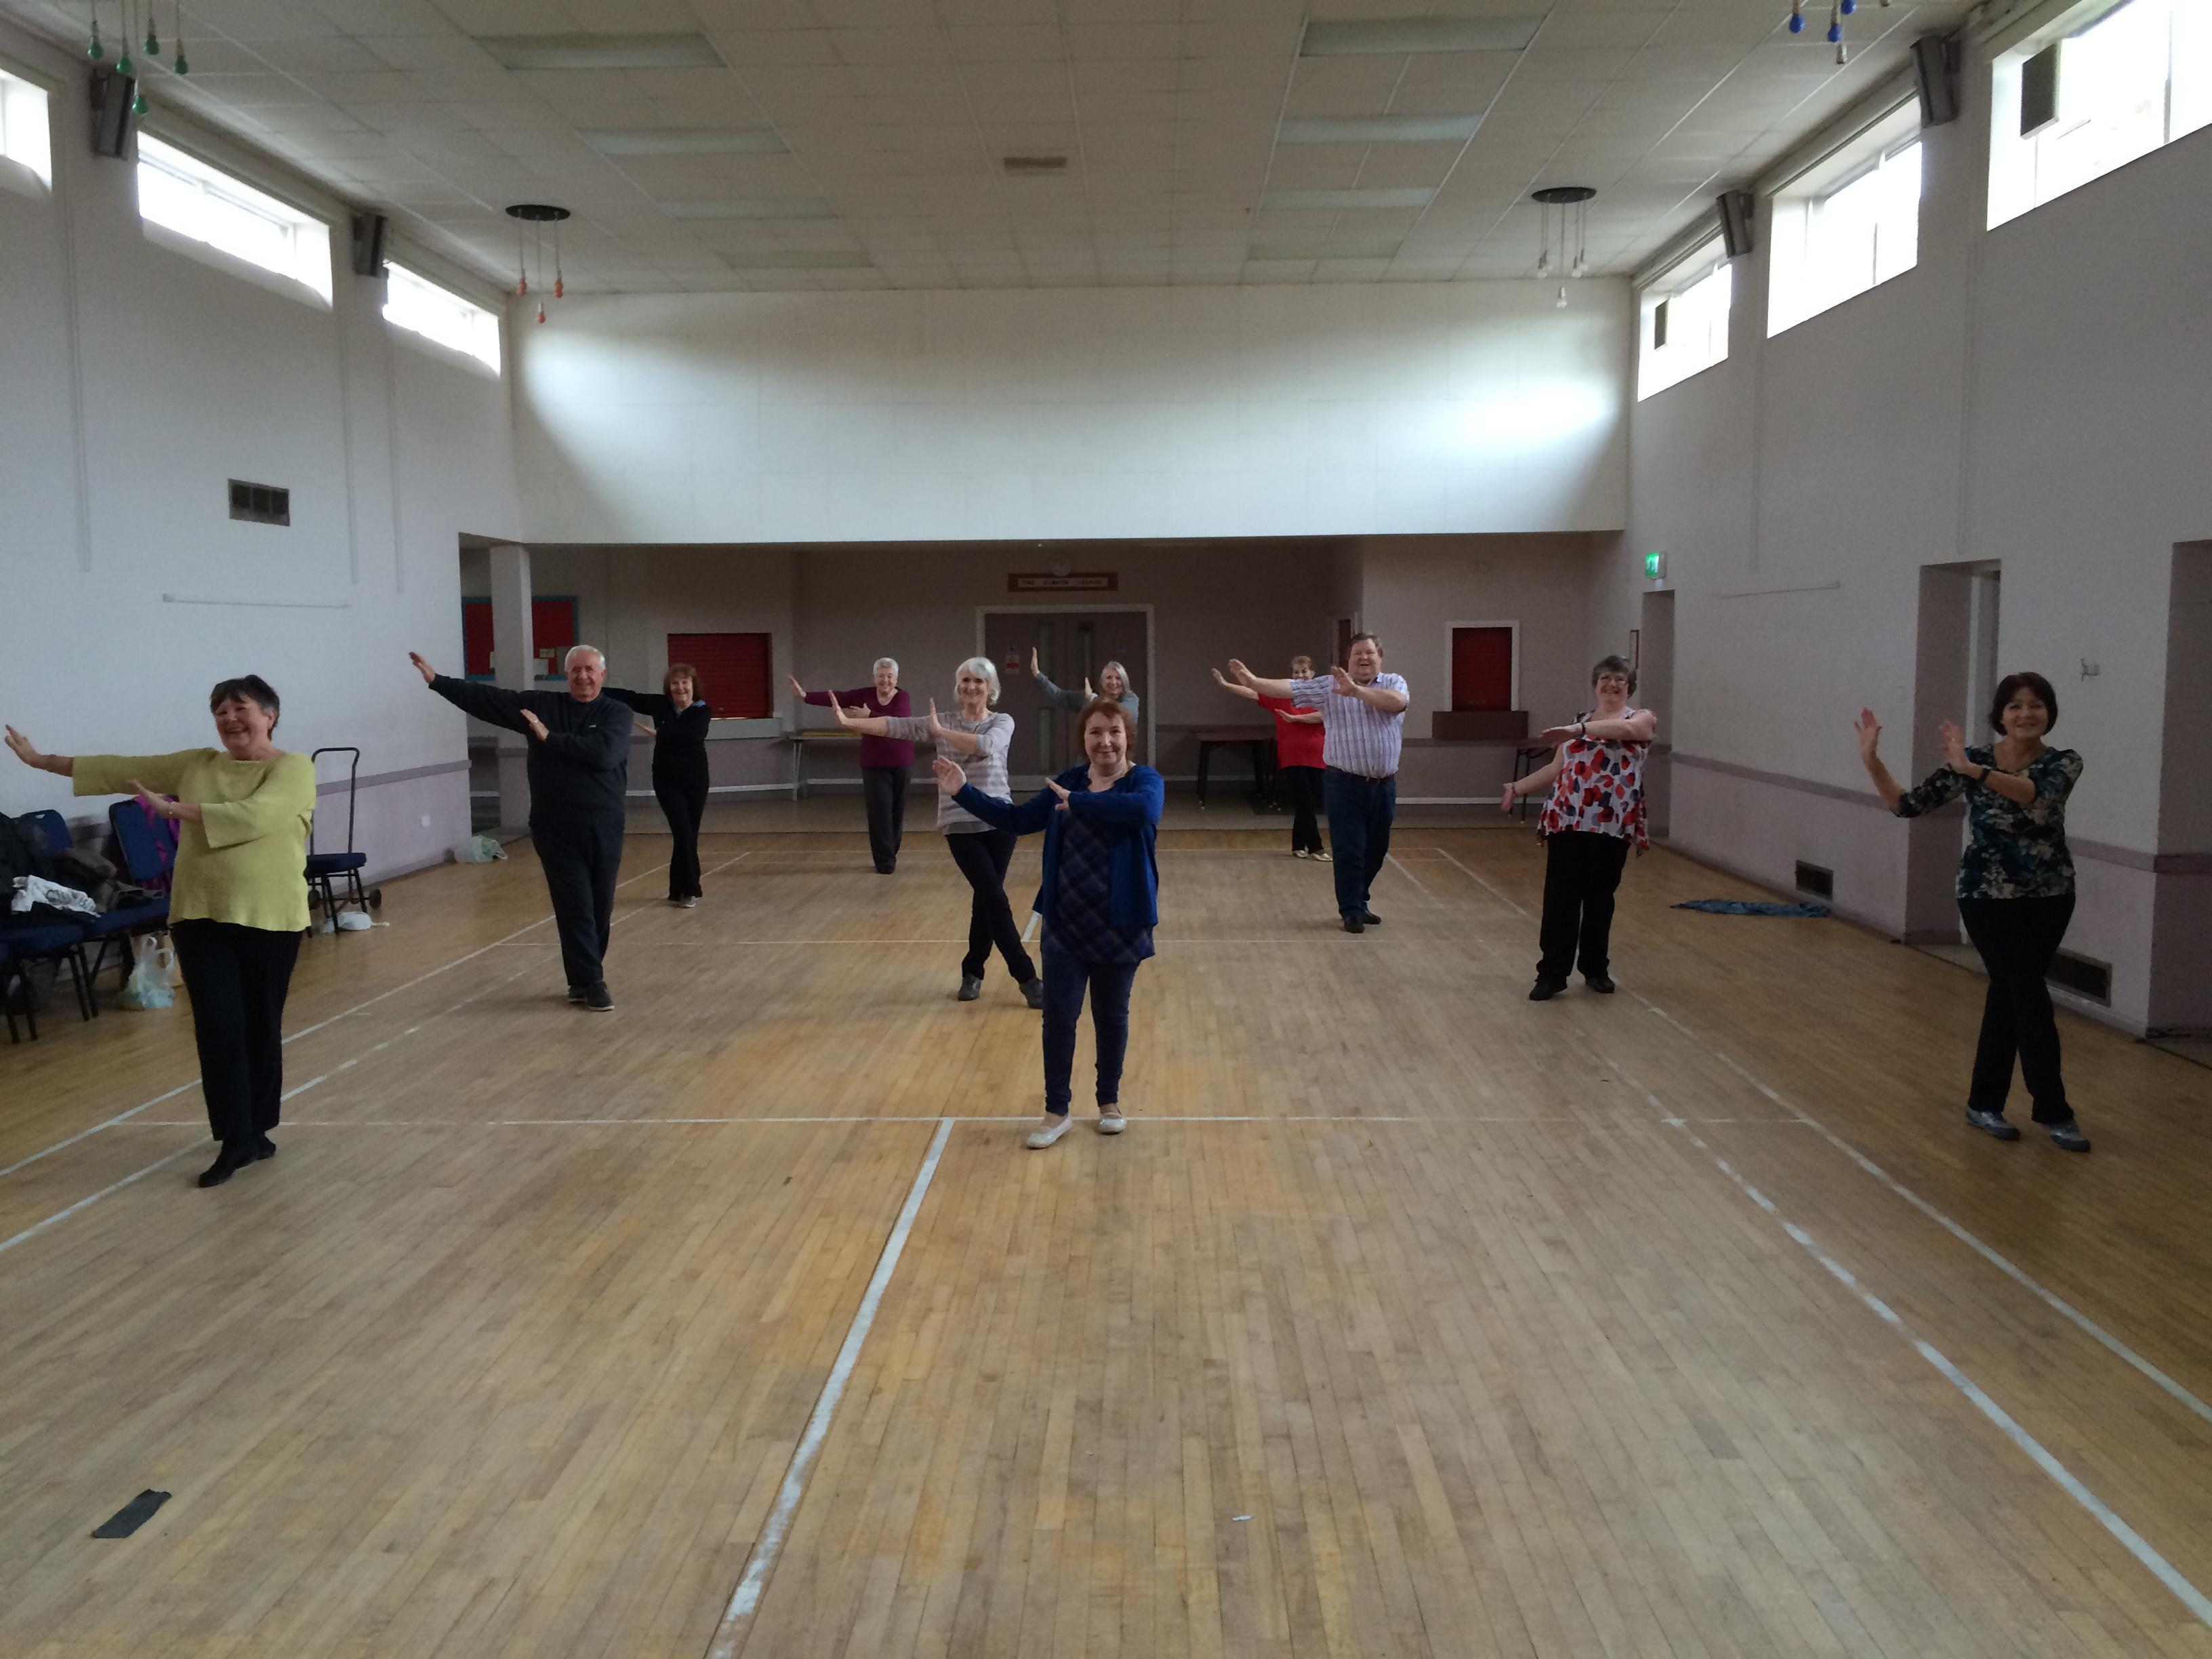 Marston Green Keep Dancing Dancers